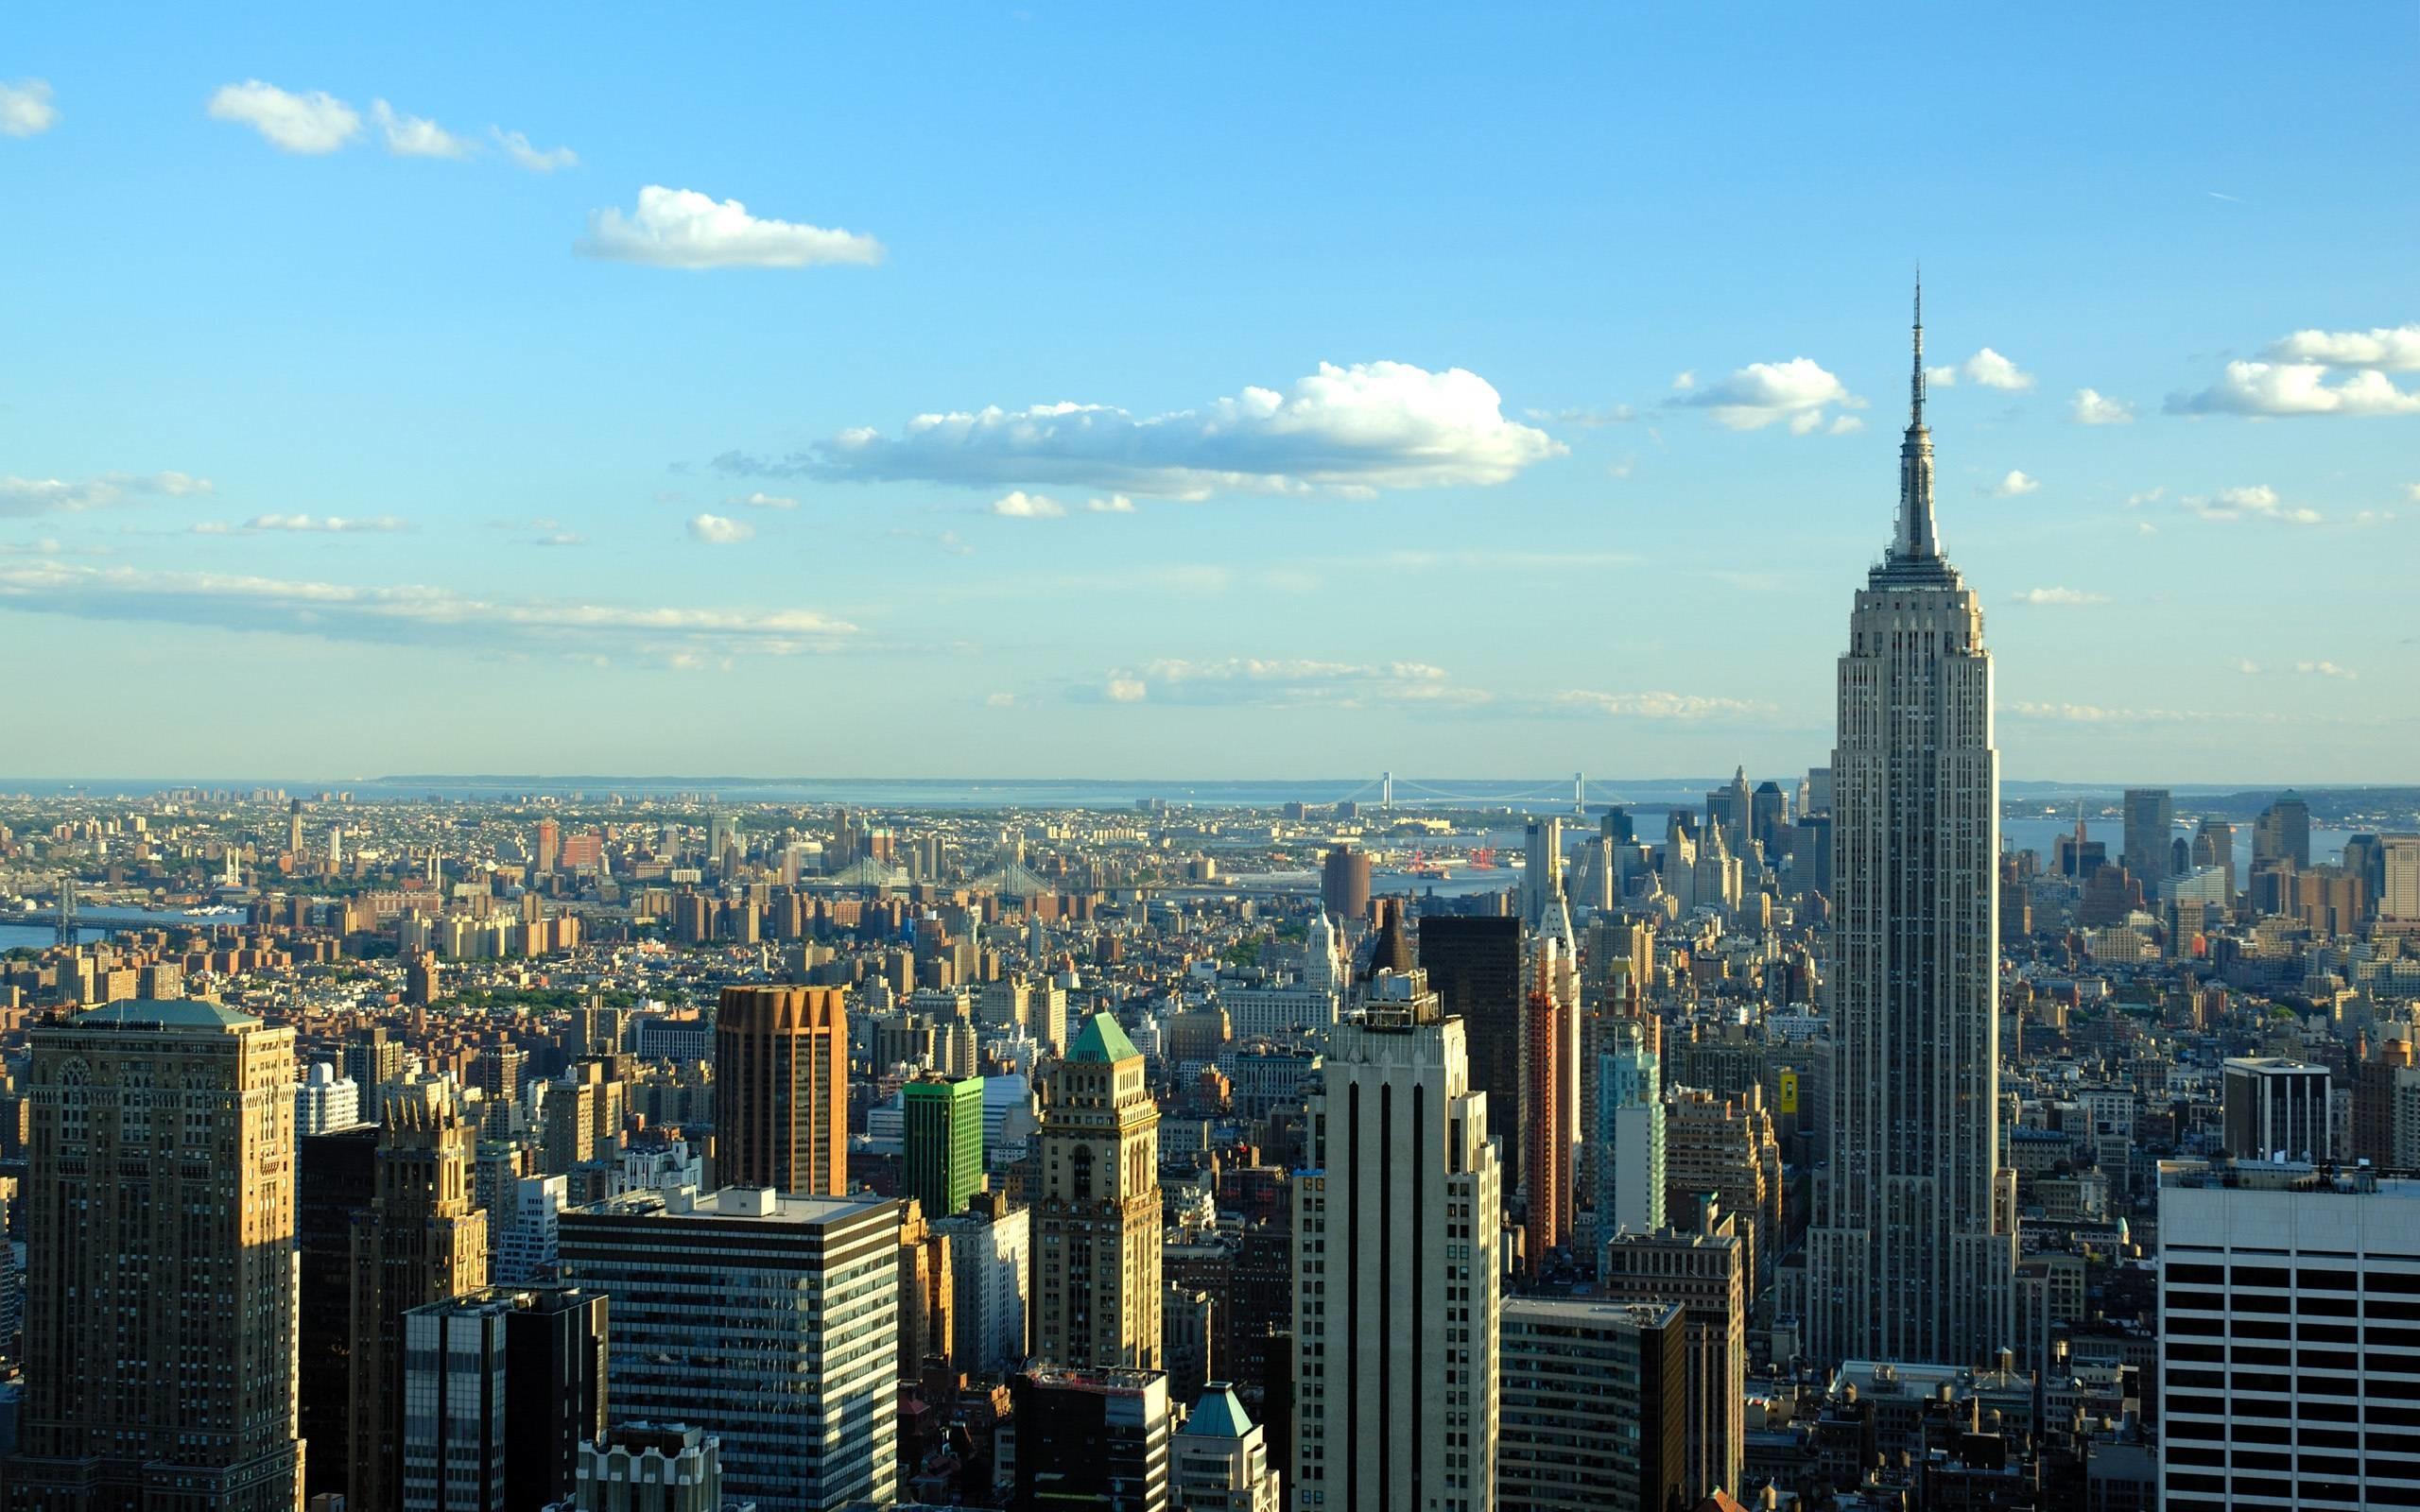 New York City Skyline Desktop Background #7776 | Frenzia.